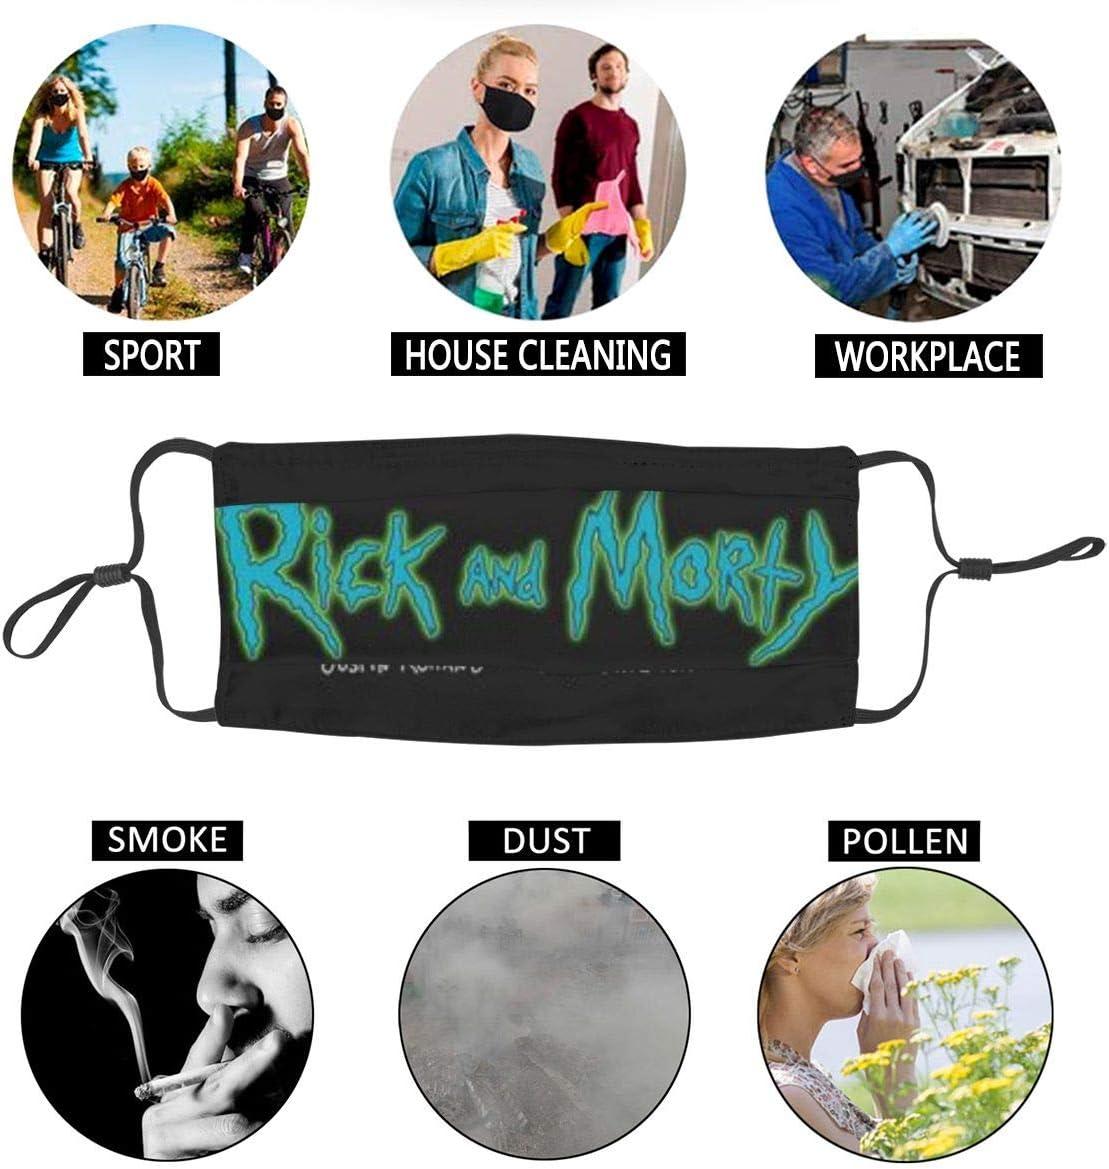 Sonickingmall Unisex Rick And Morty m/áscara facial cubierta pasamonta/ñas a prueba de polvo pa/ñuelo para polvo viento